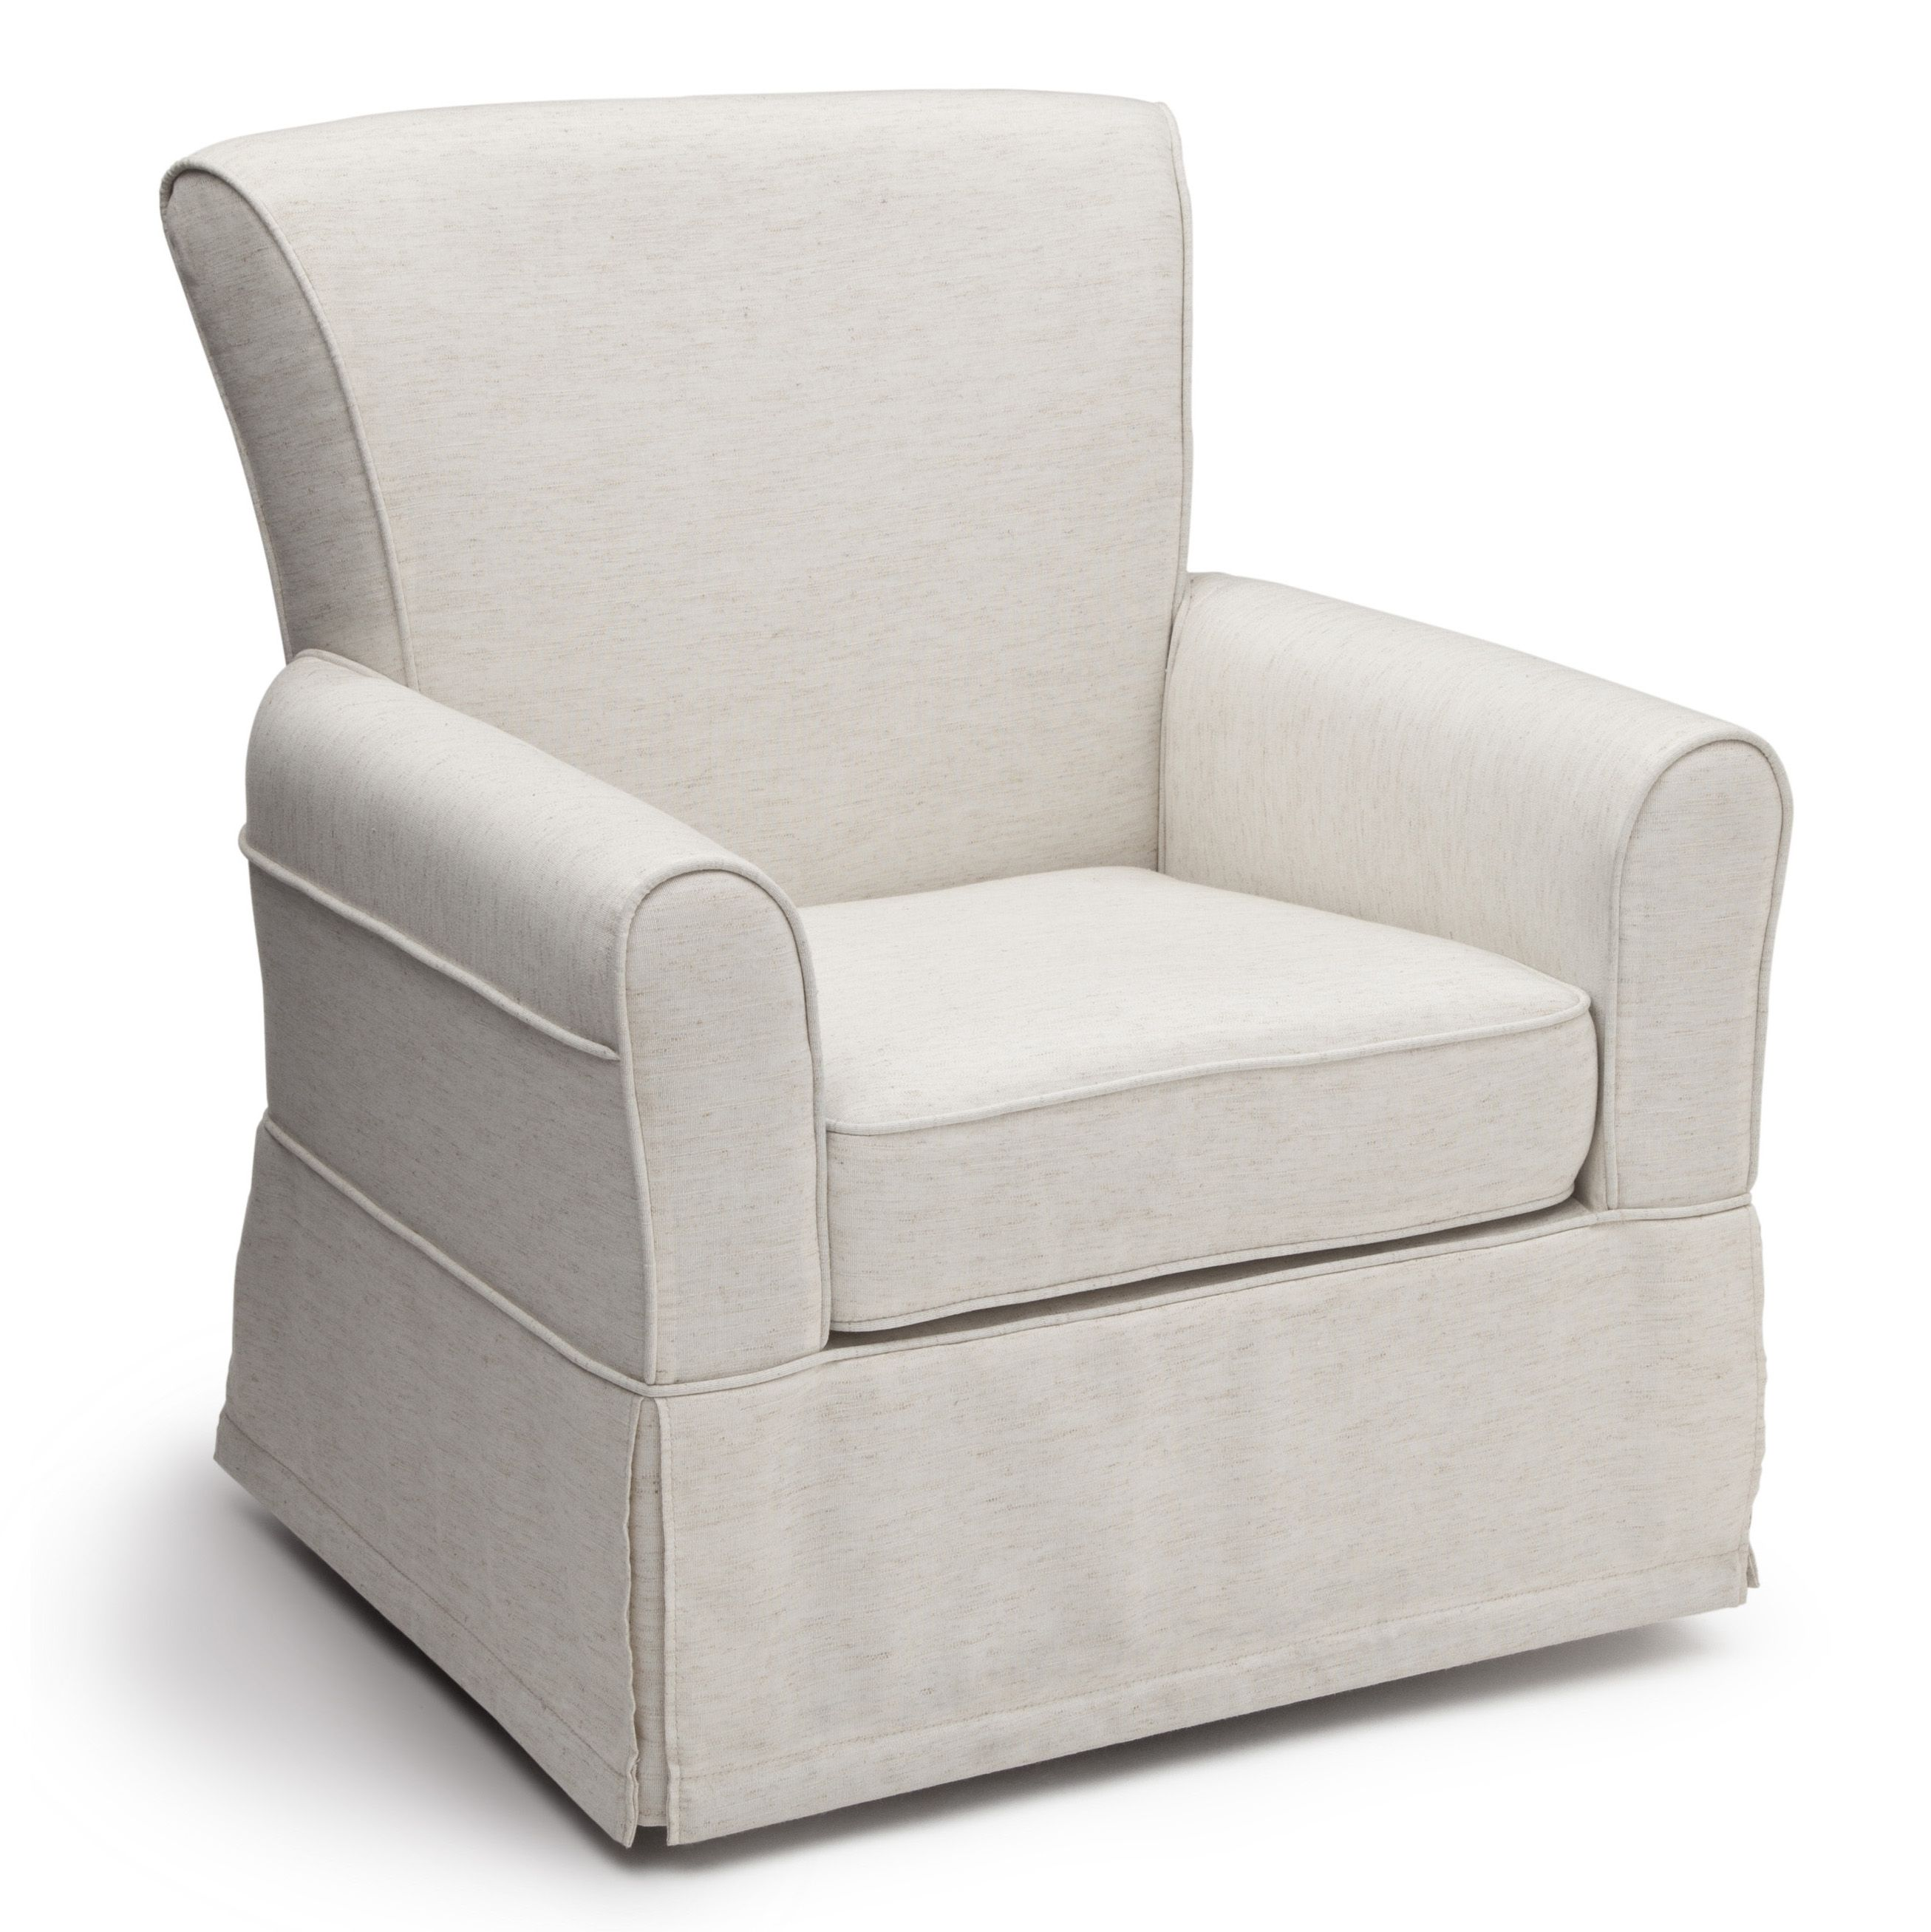 Baby Swivel rocker chair, Glider rocking chair, Swivel